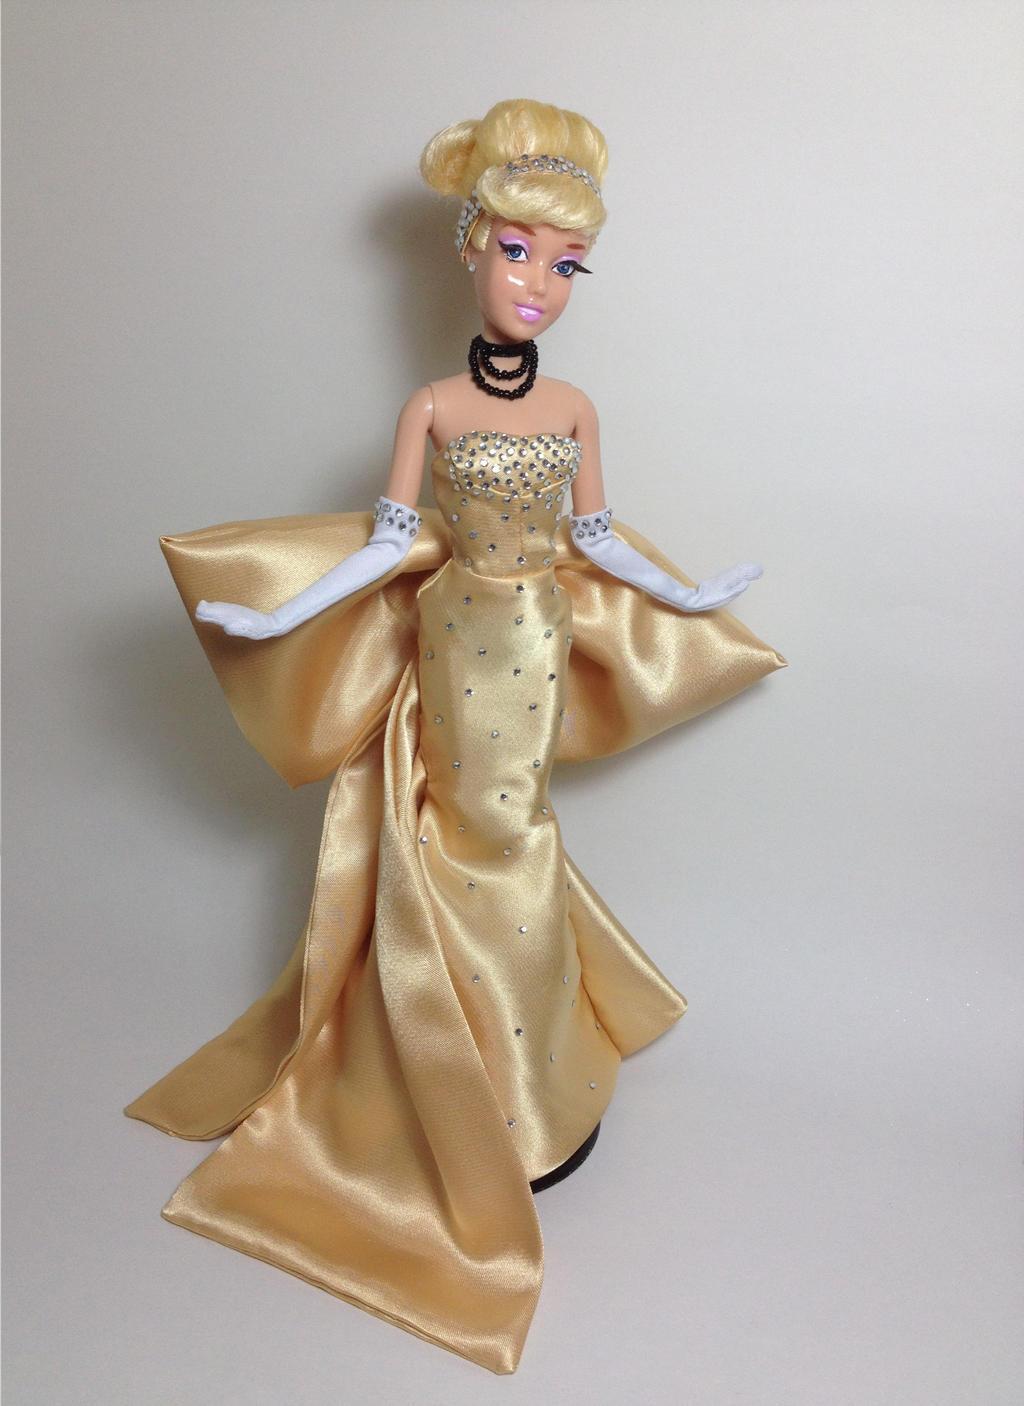 Disney Designer Golden Cinderella Ooak Doll by RCOCO-DOLLS